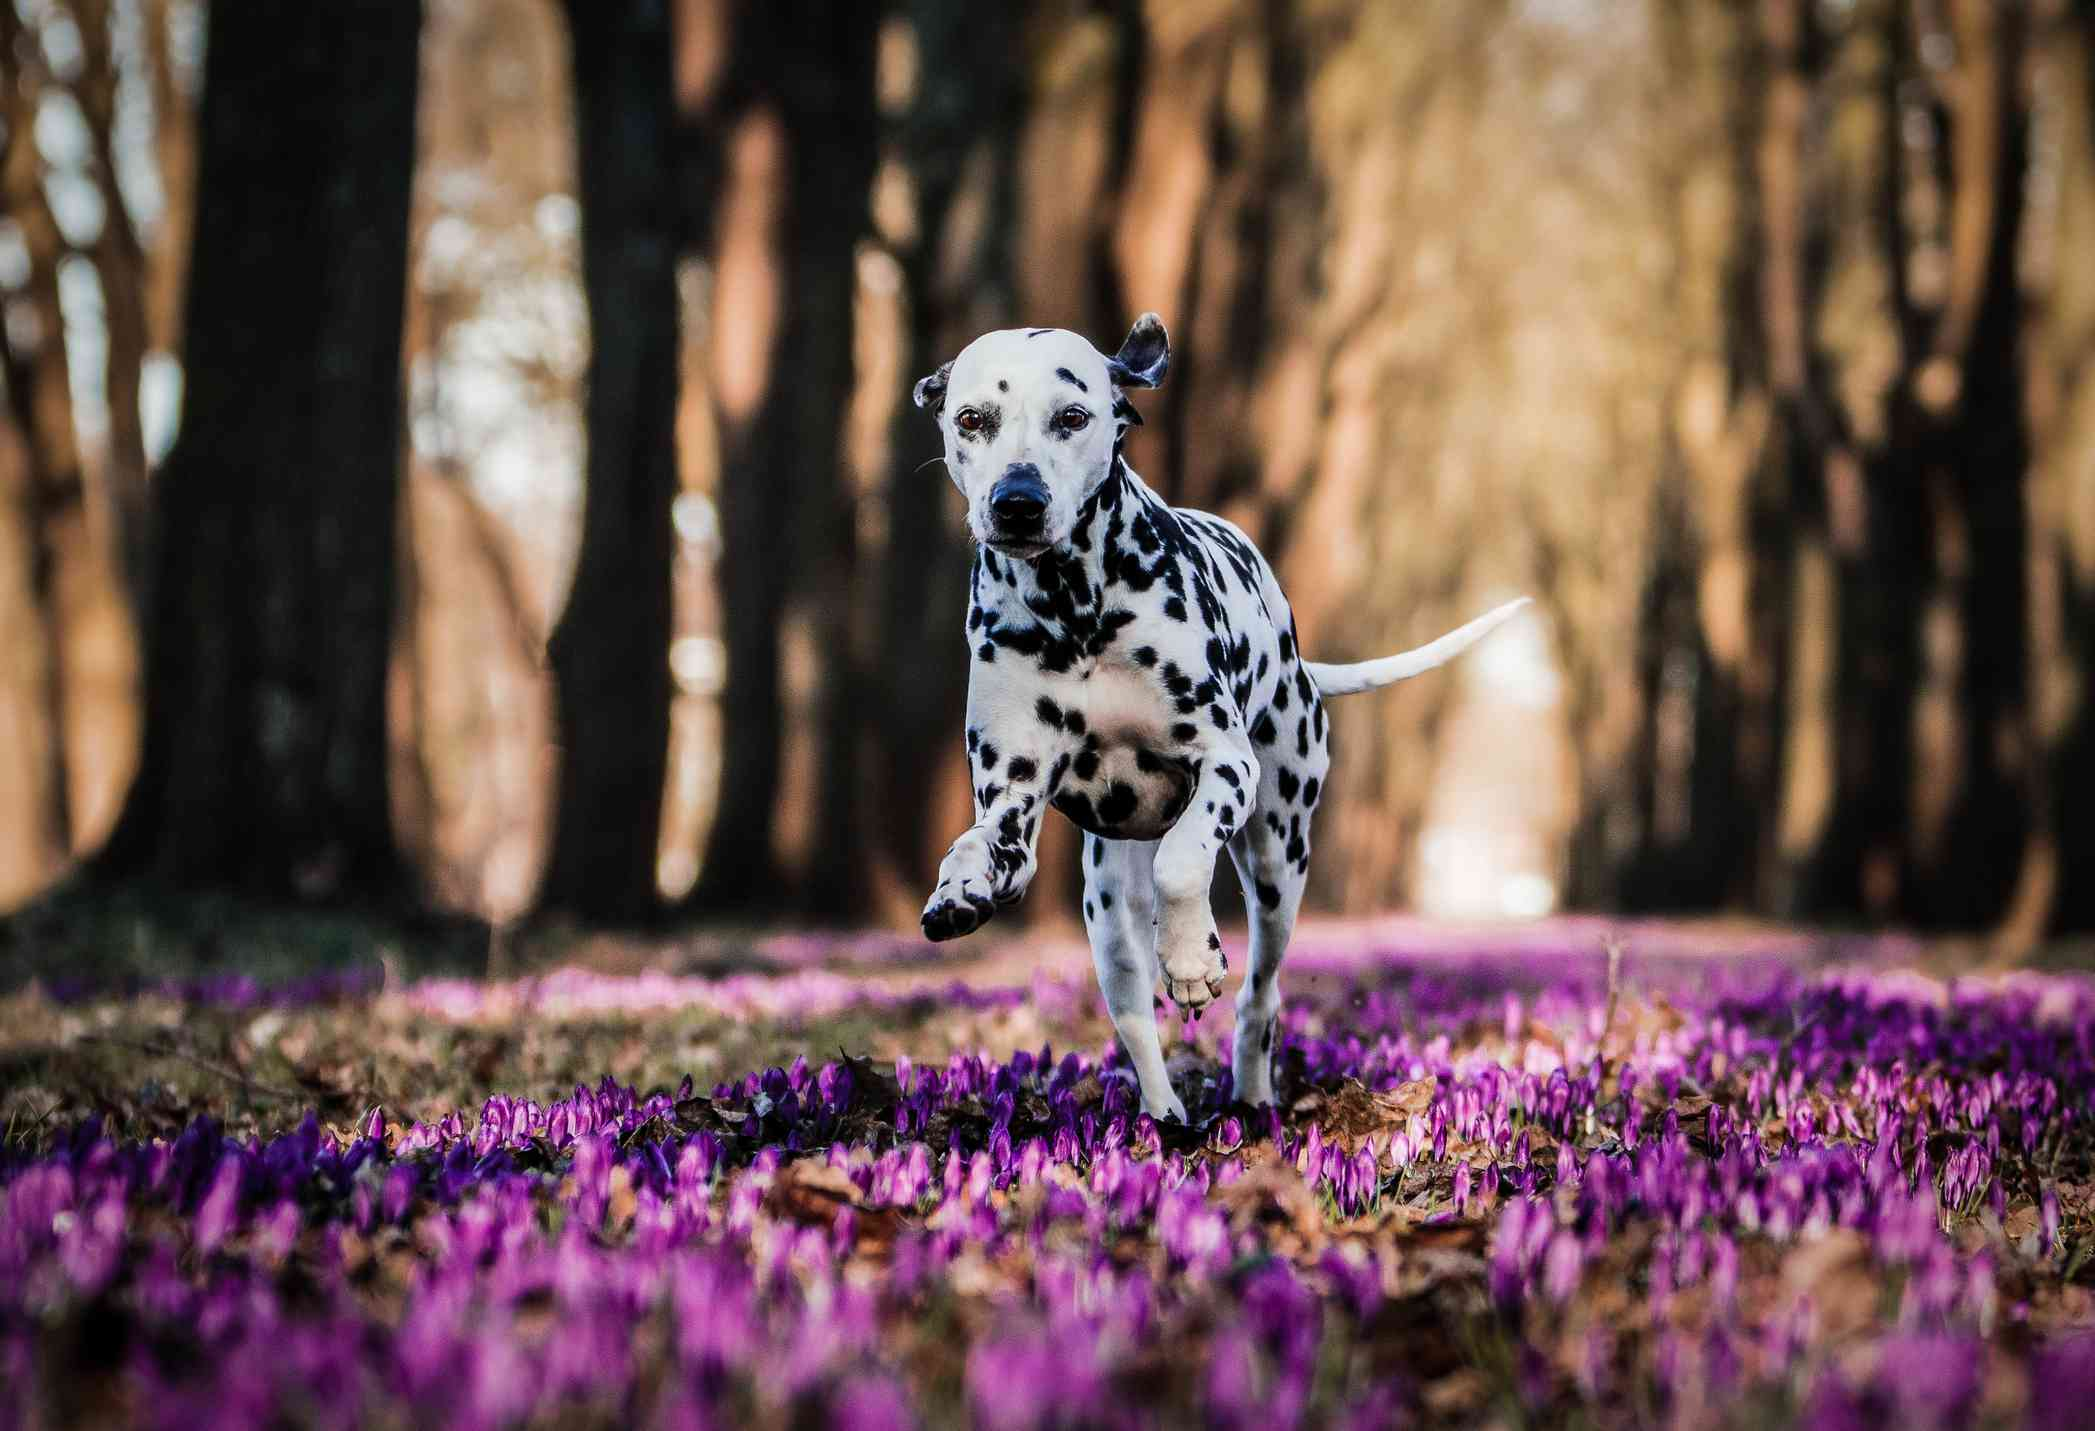 Dalmation dog running over purple flowers